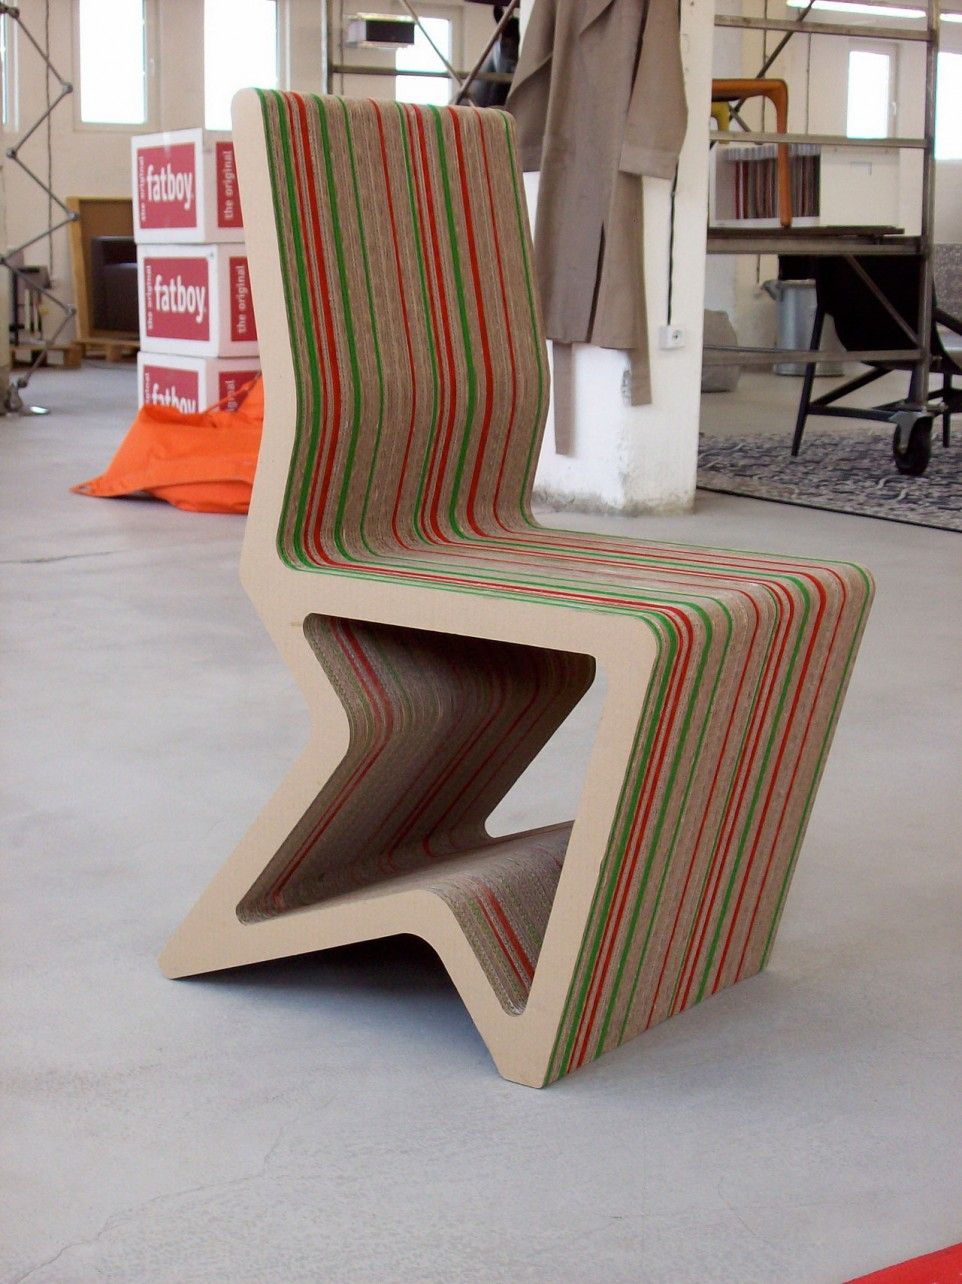 Home Interior, Be Creative to Make Cardboard Furniture